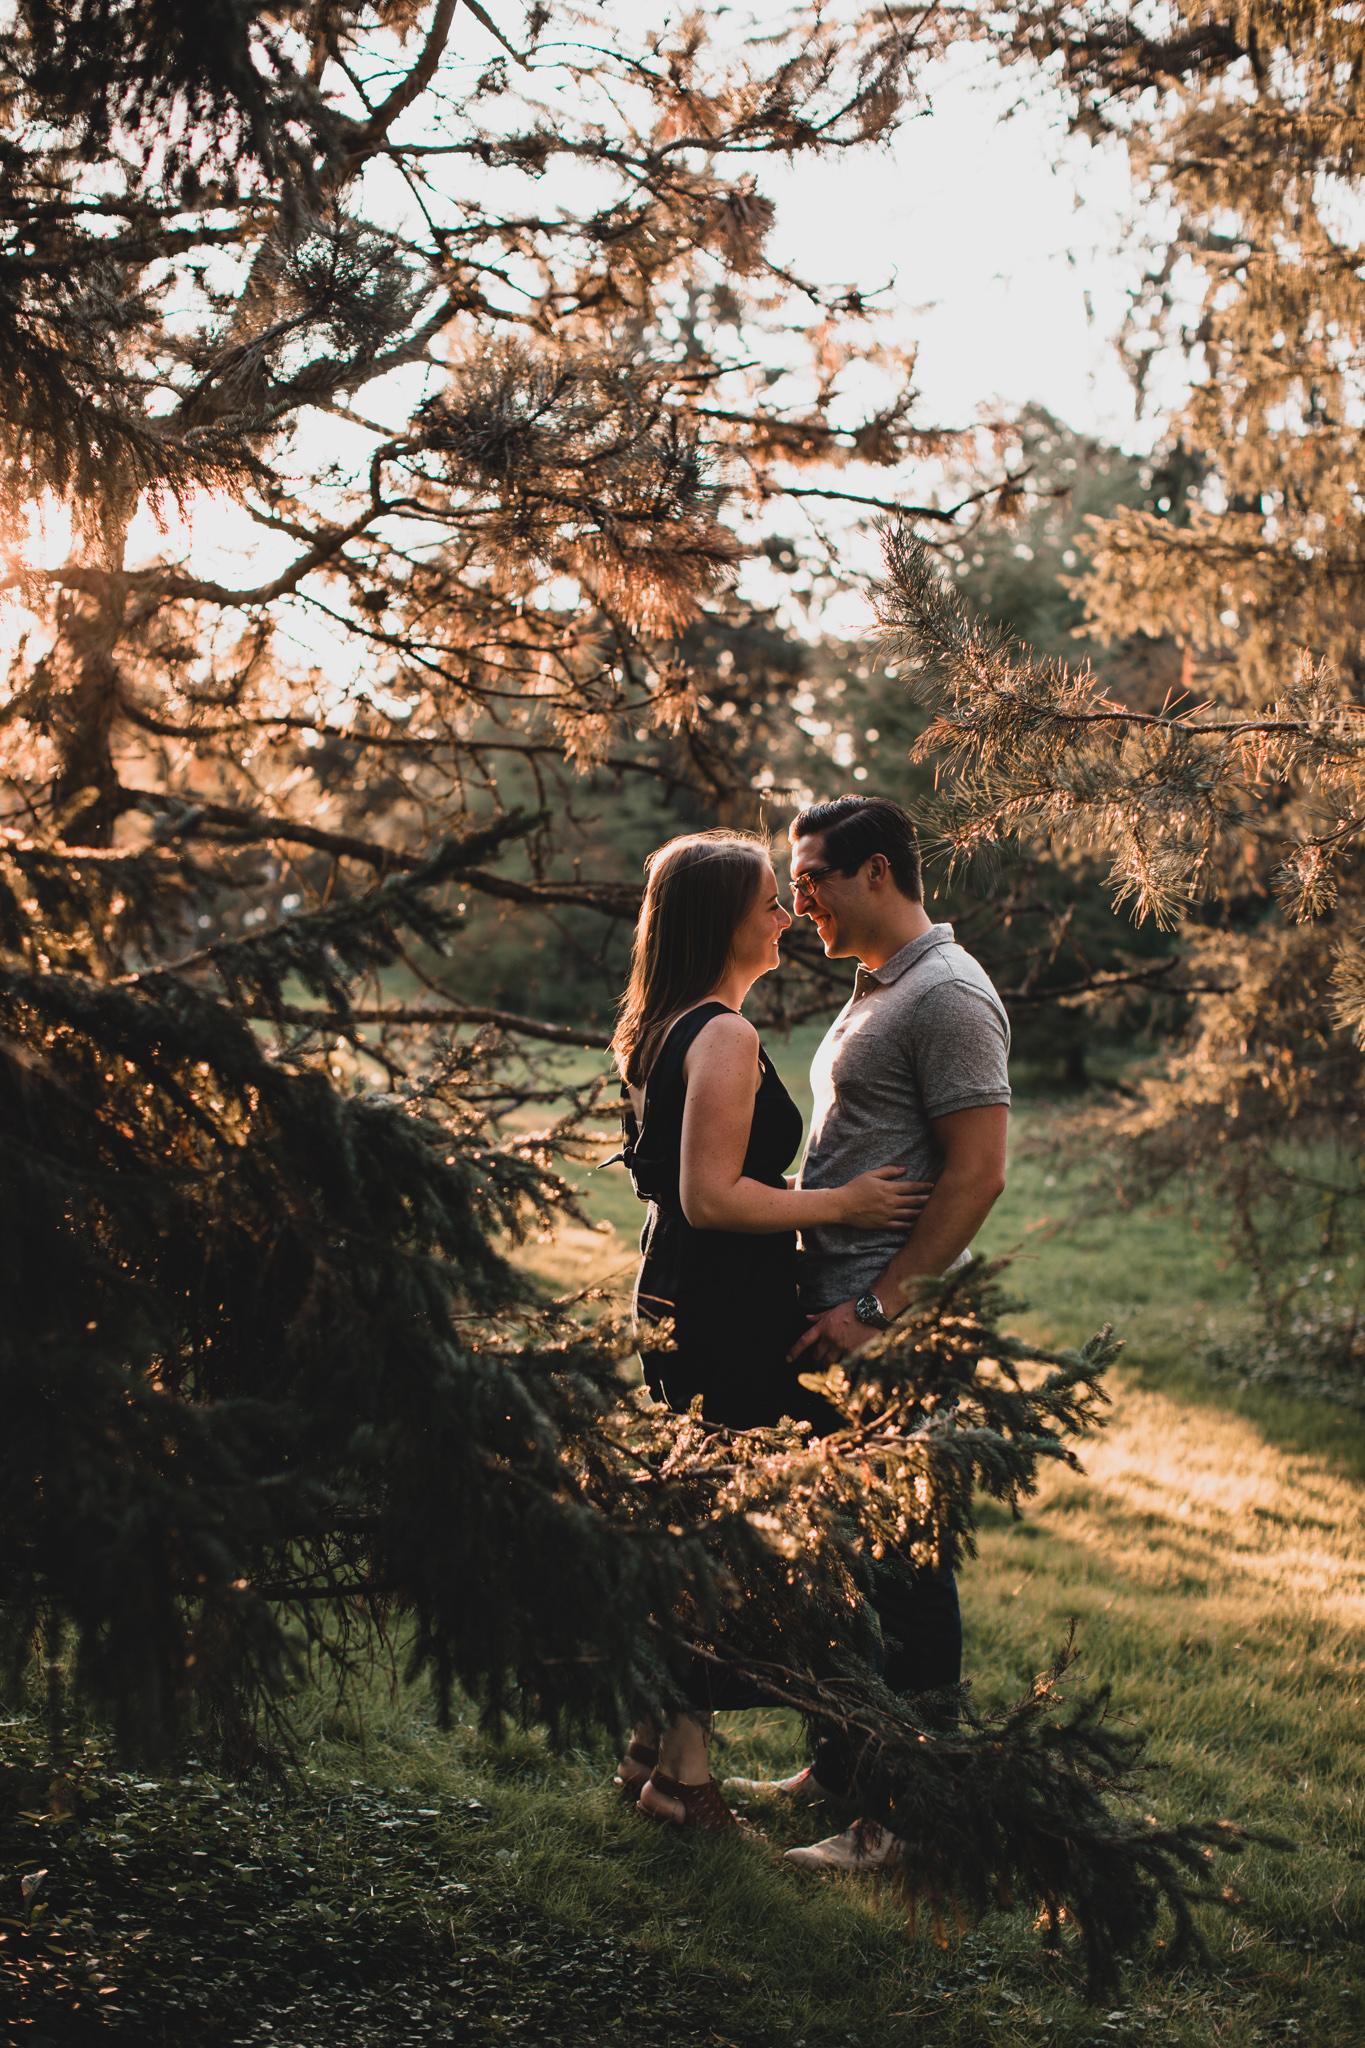 064-WEB-Jonathan-Kuhn-Photography-Dave-Susan-Engagement-3280.jpg